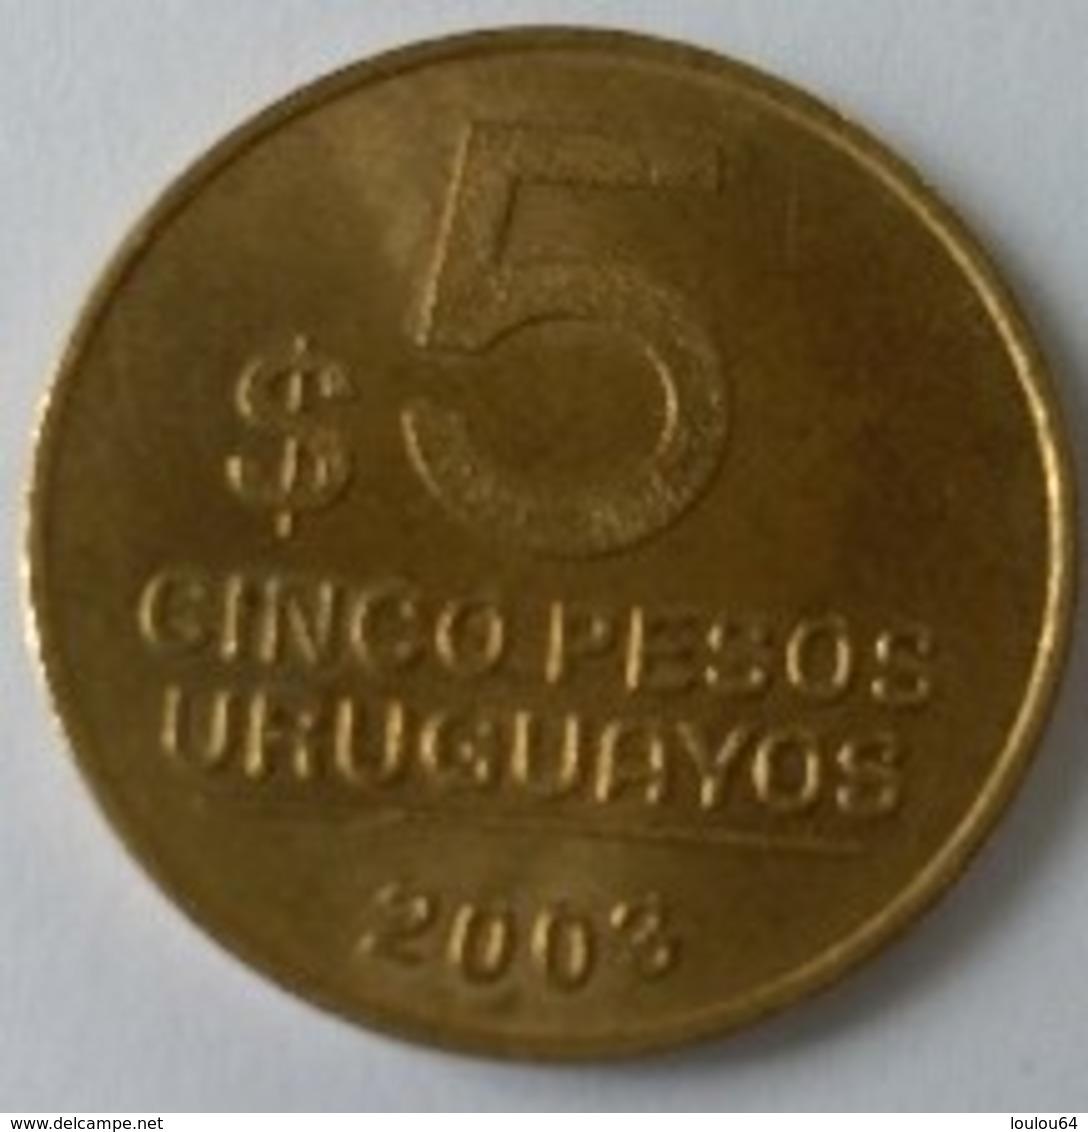 5  PESOS  URUGUAYOS  2003 - URUGUAY - Superbe - - Uruguay